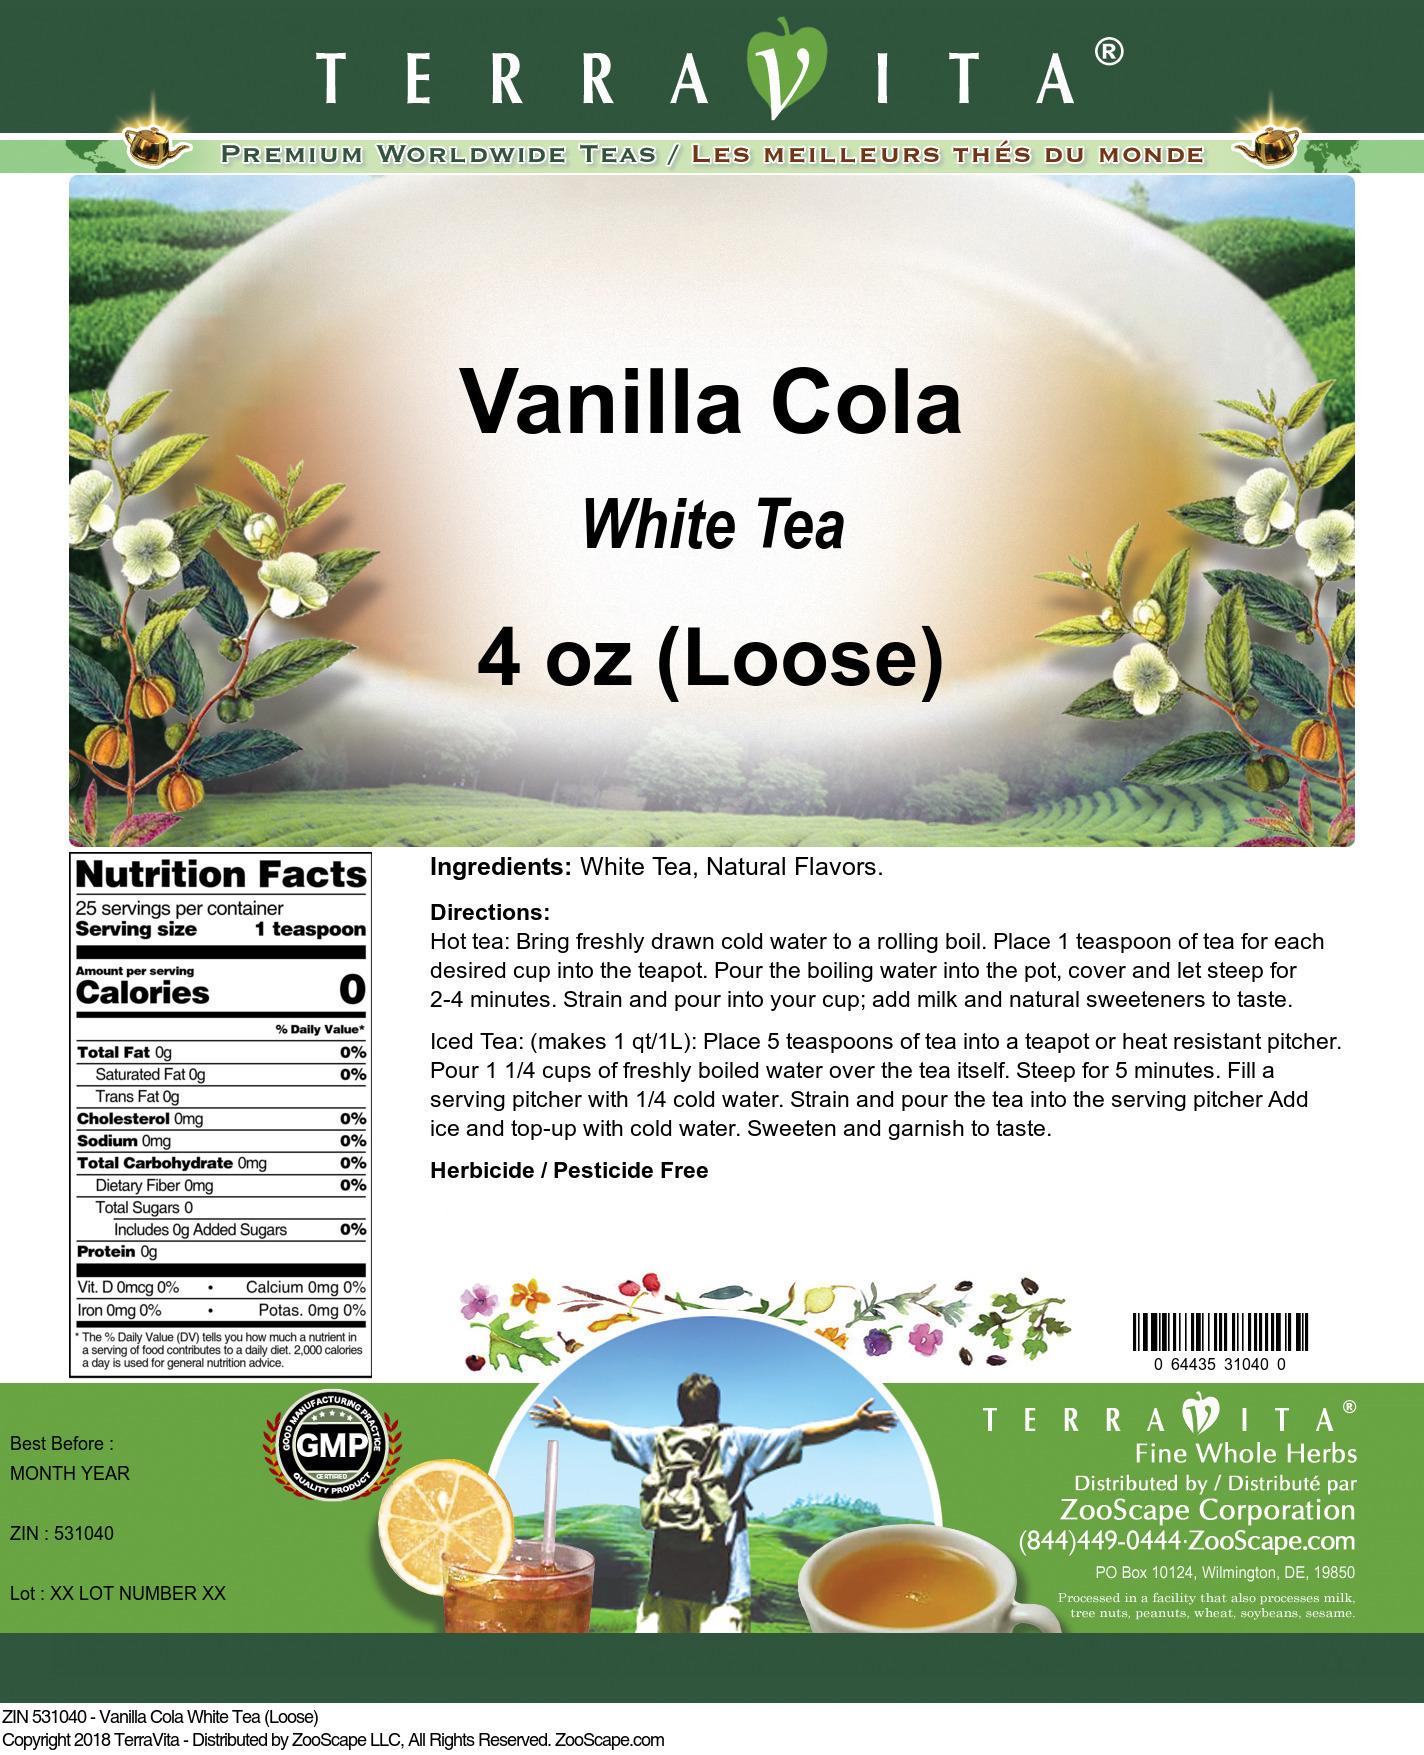 Vanilla Cola White Tea (Loose)